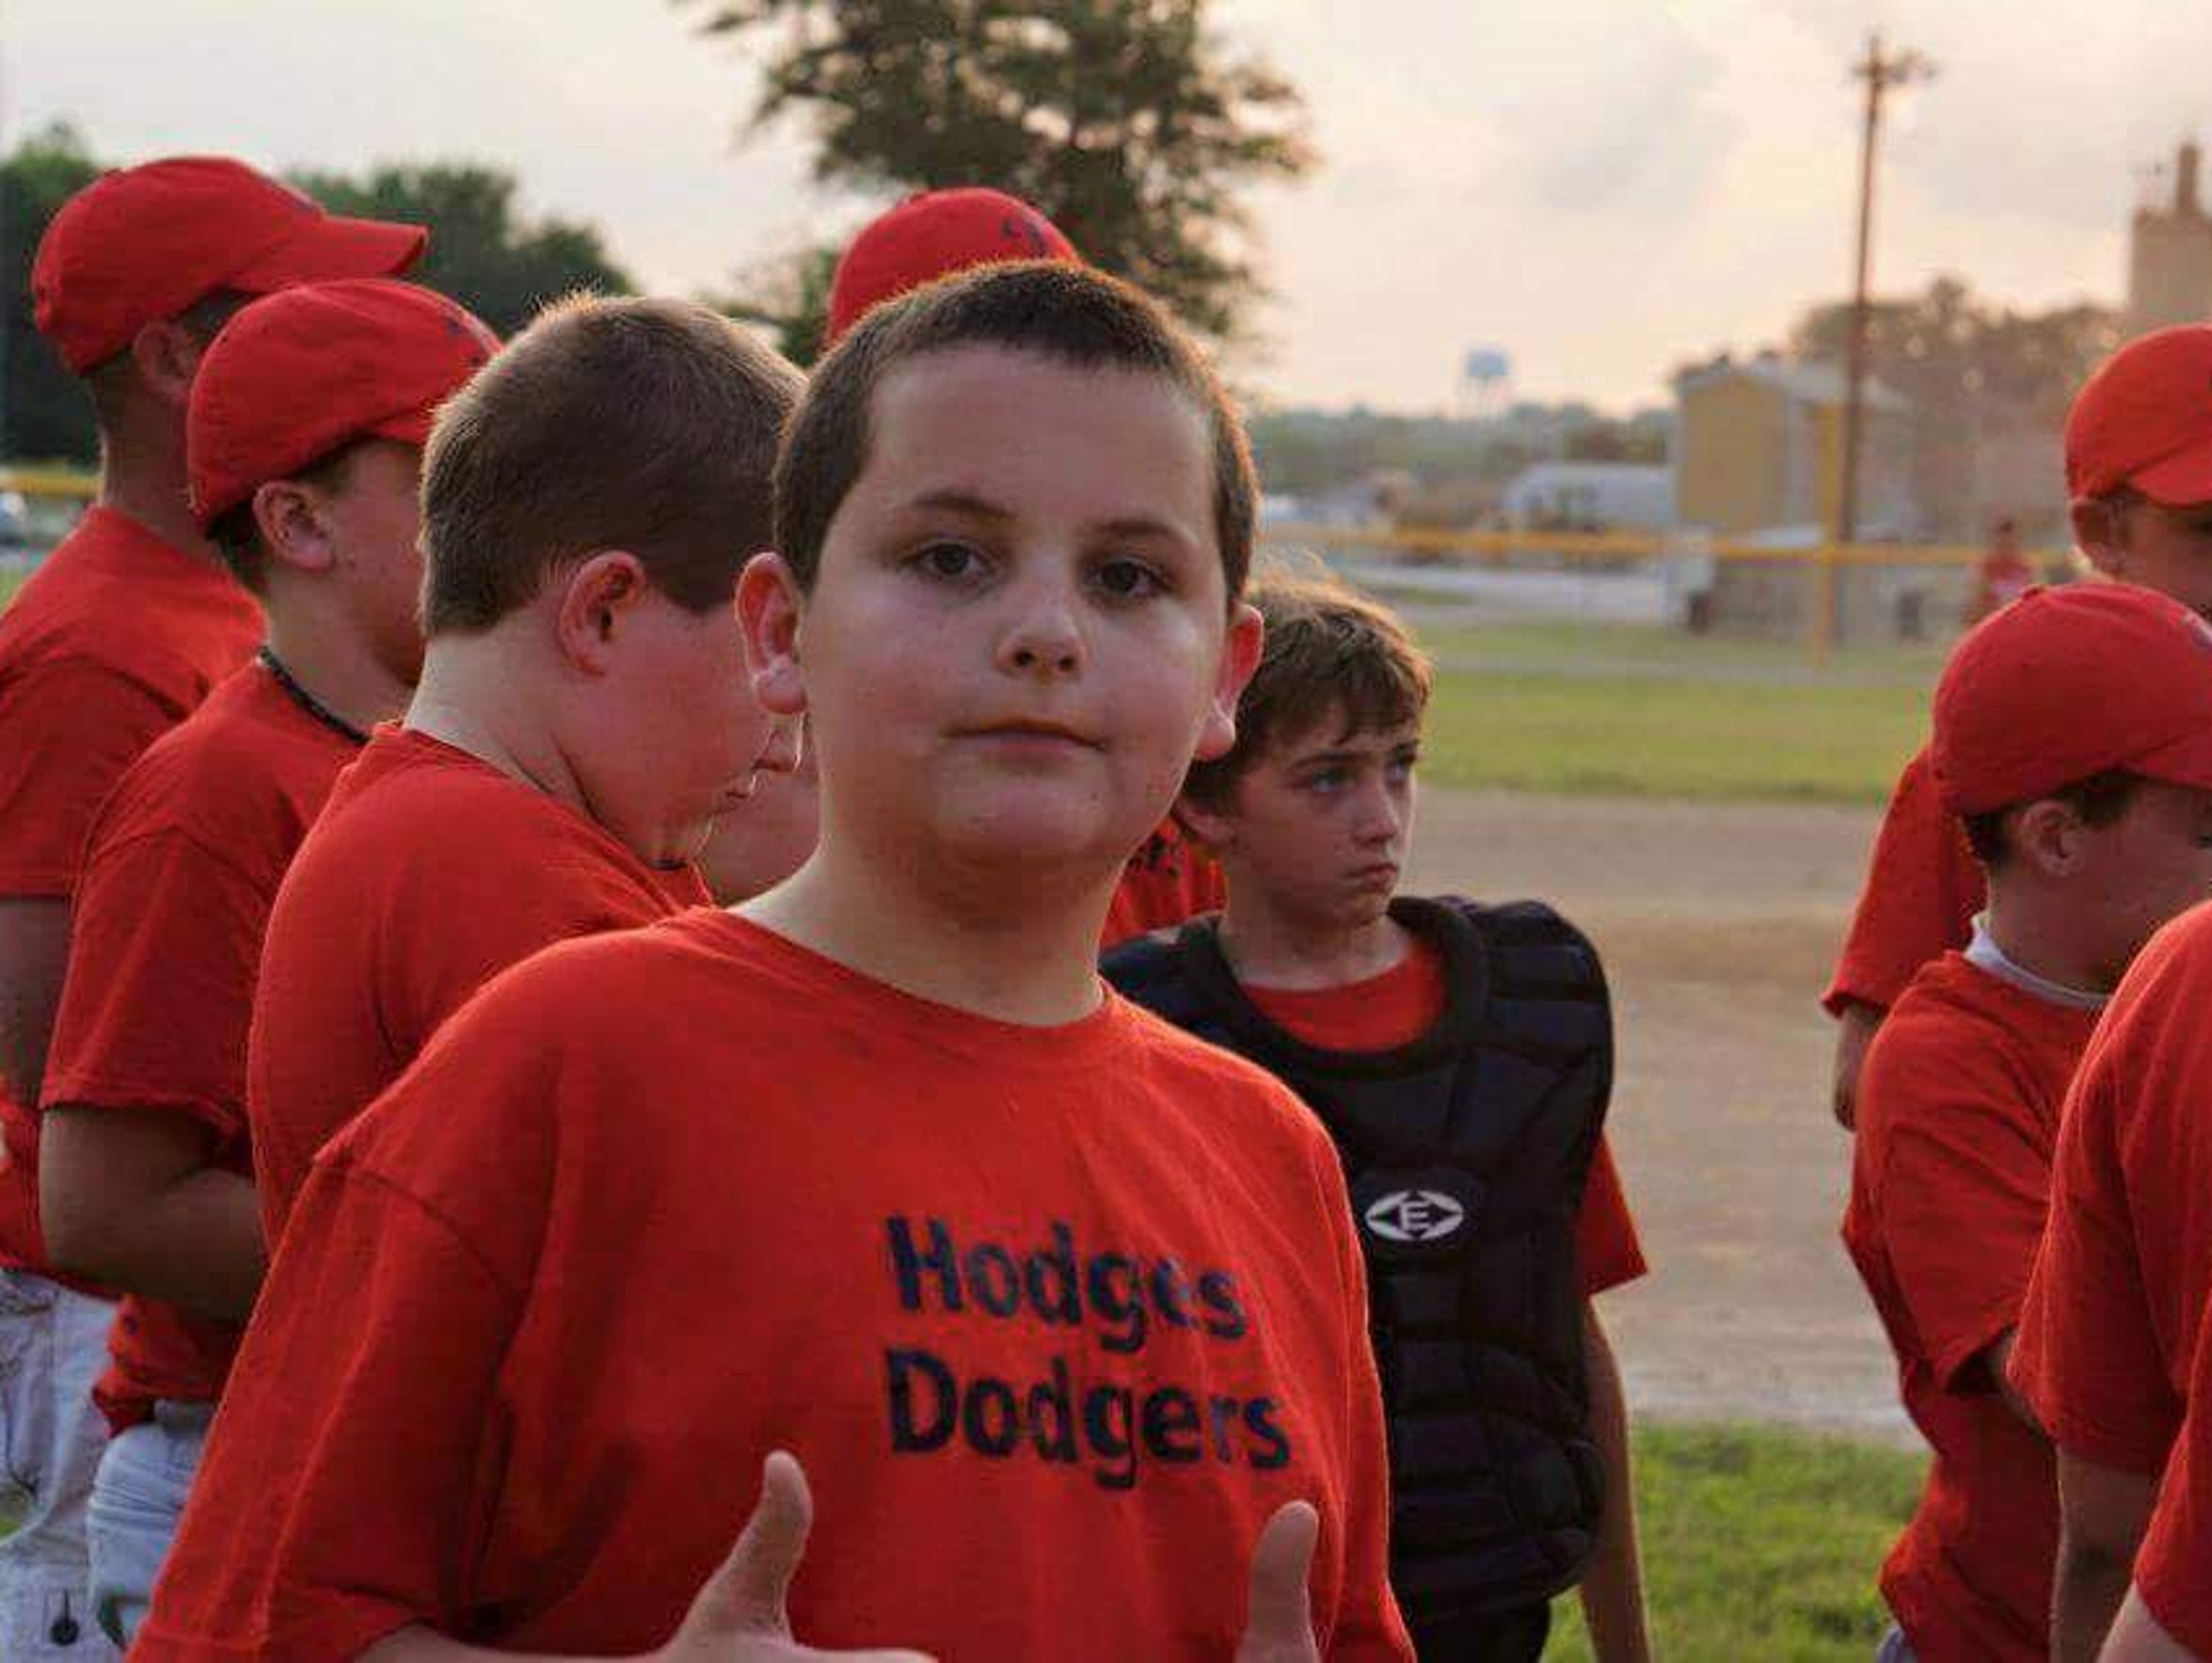 Robert loved sports, including baseball.